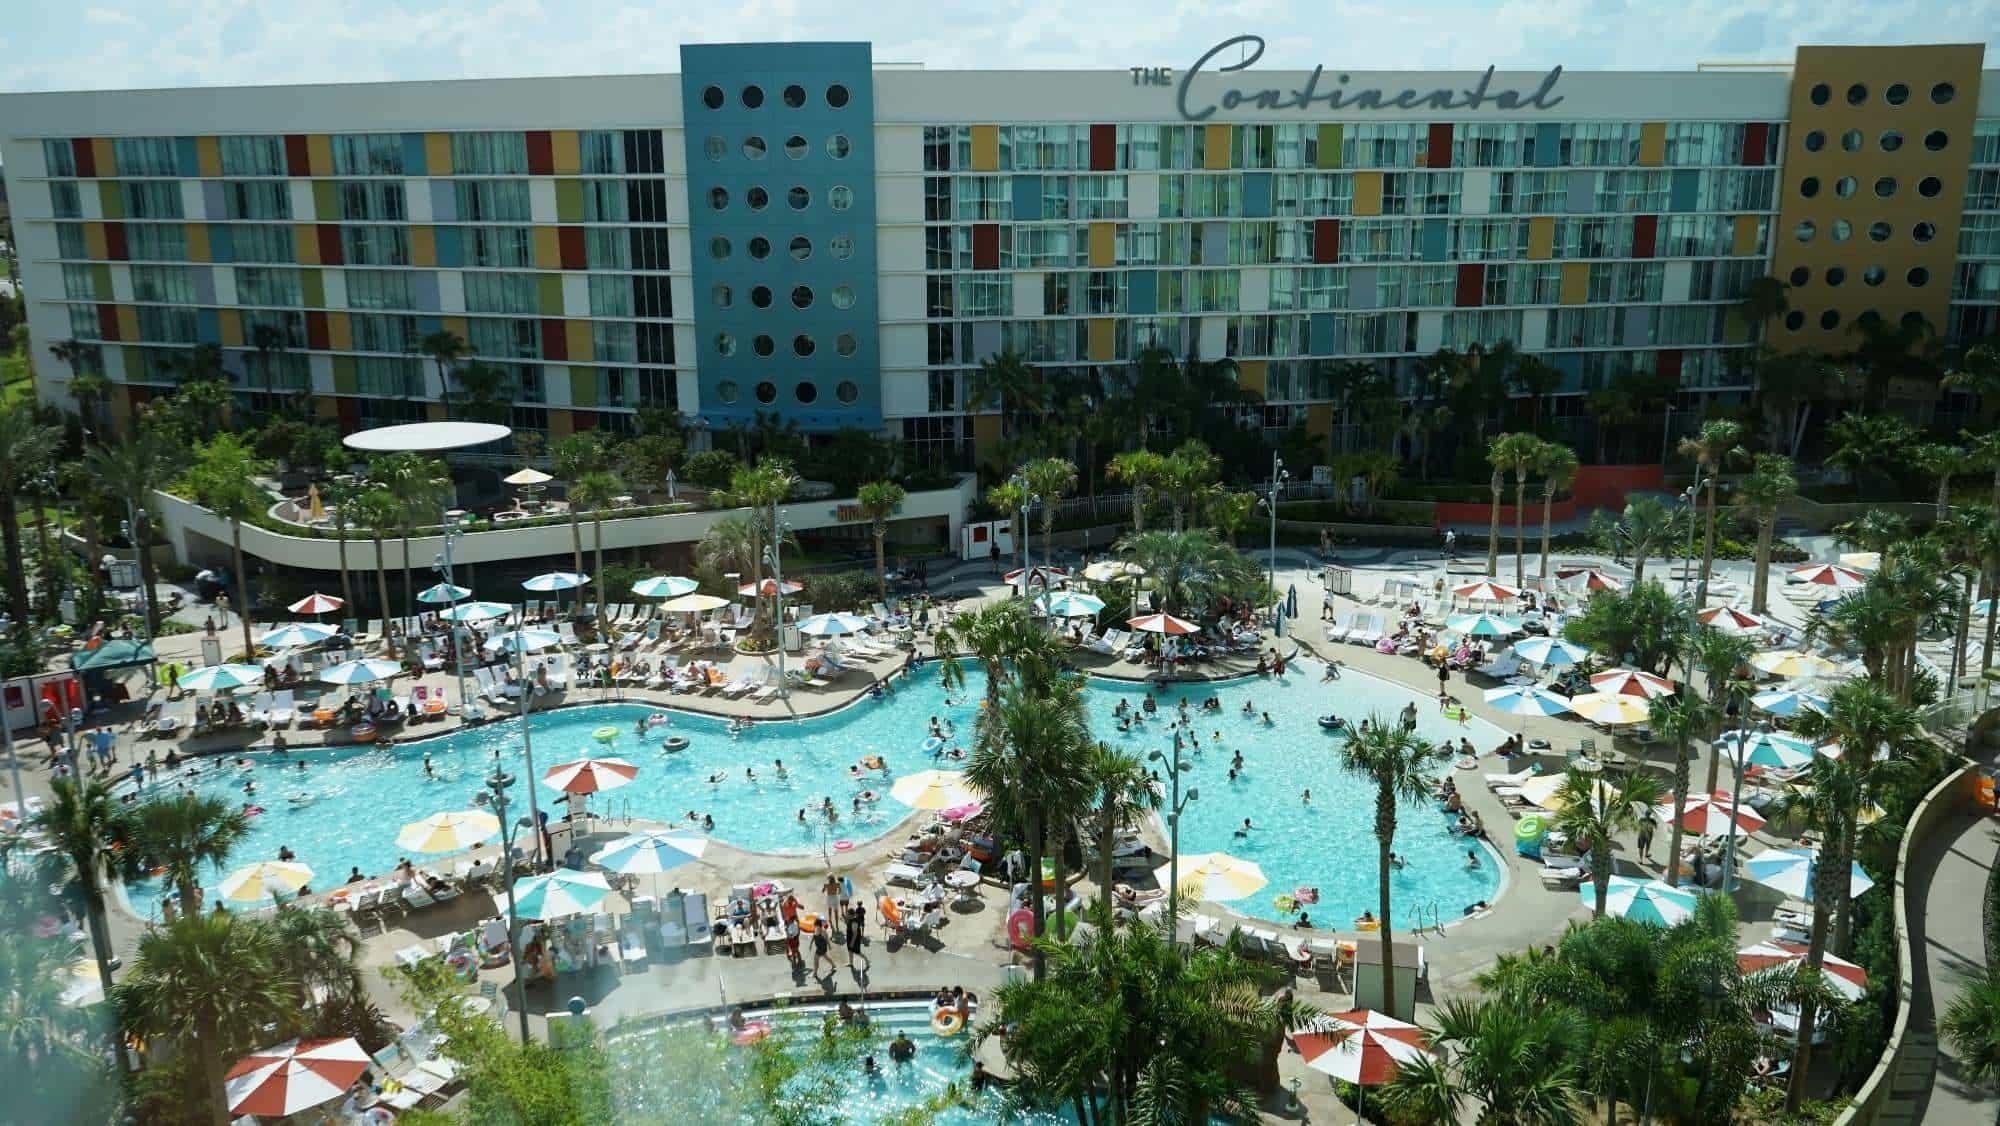 TR Floride 2018 : Universal + WDW + 1ère DCL ! Cabana-bay-beach-resort-08-30-14-8799-oi